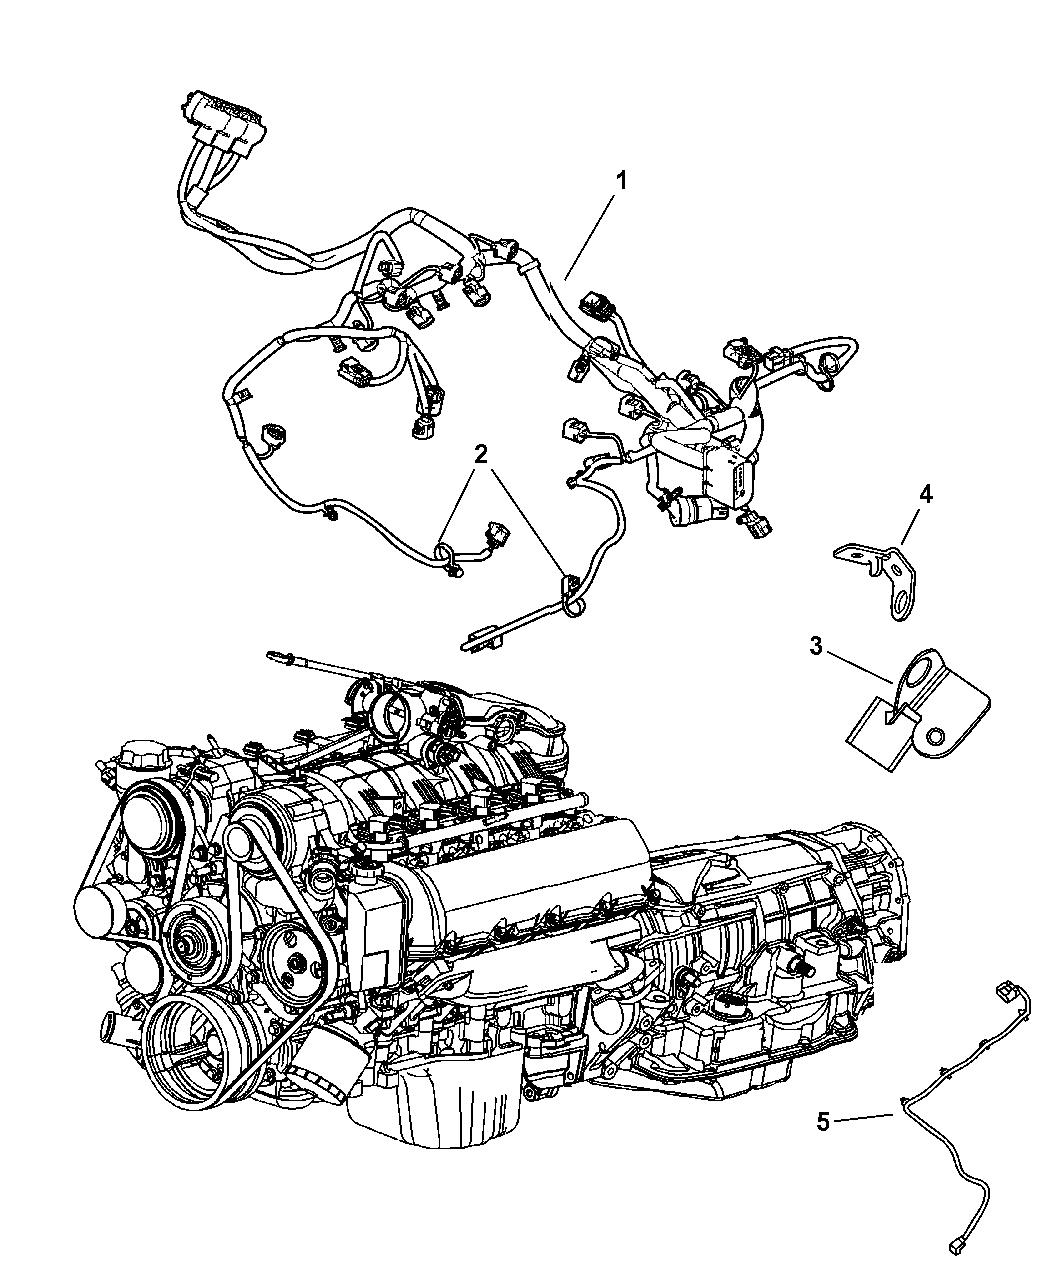 2005 Jeep Grand Cherokee Wiring - Engine